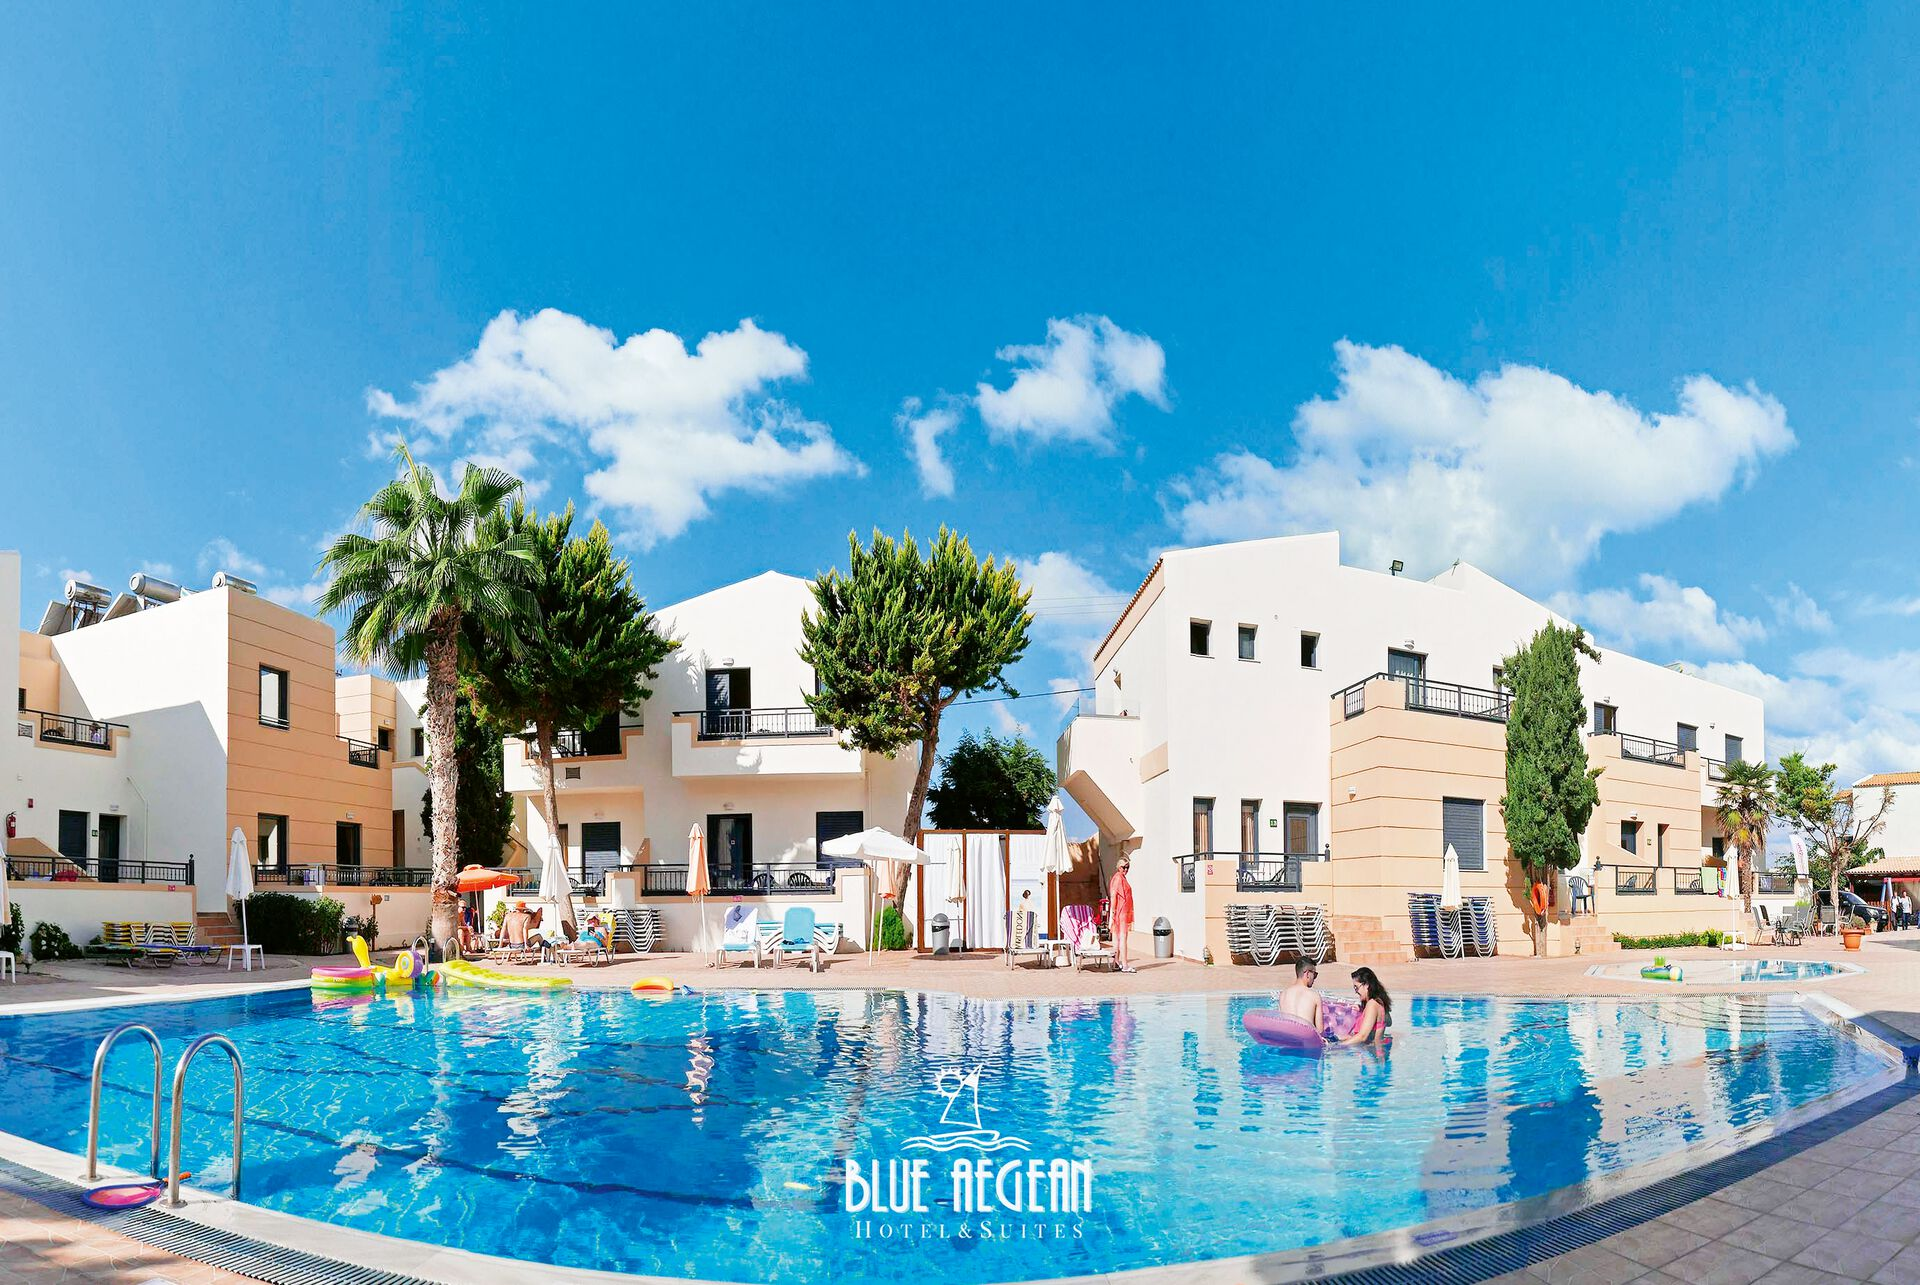 Hôtel Blue Aegean Hotel & Suites 4*